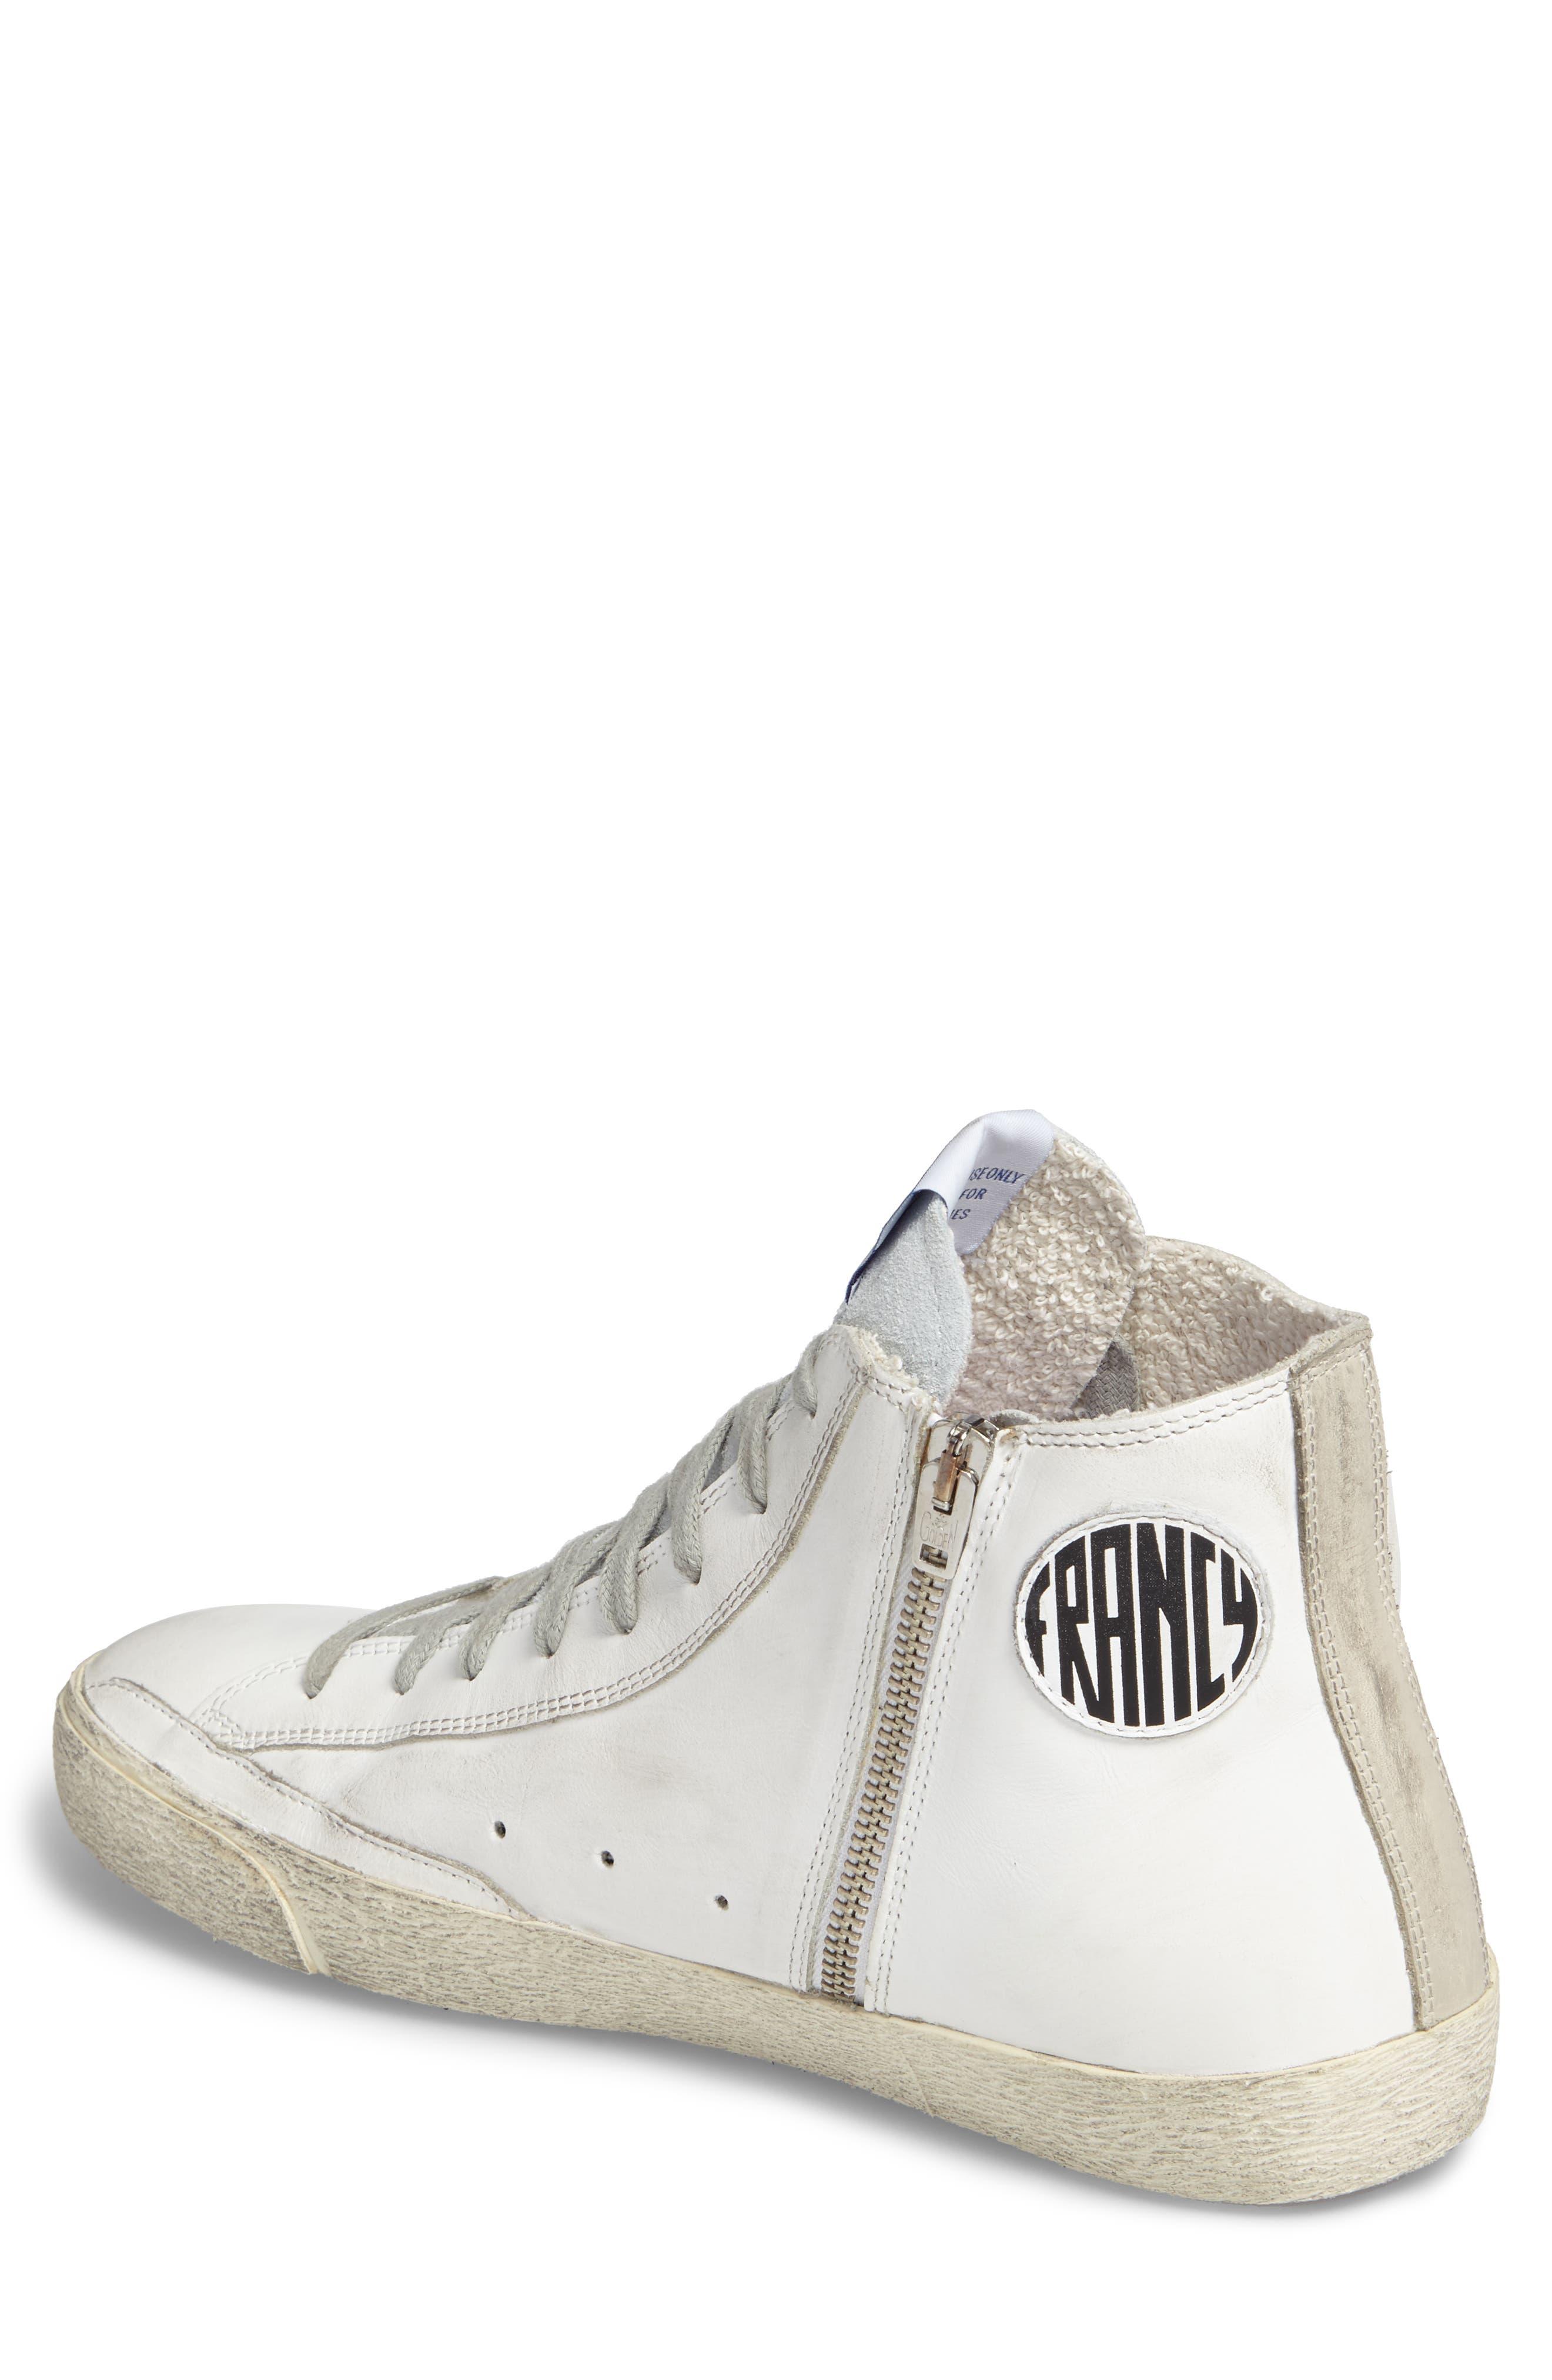 Francy High Top Sneaker,                             Alternate thumbnail 2, color,                             100